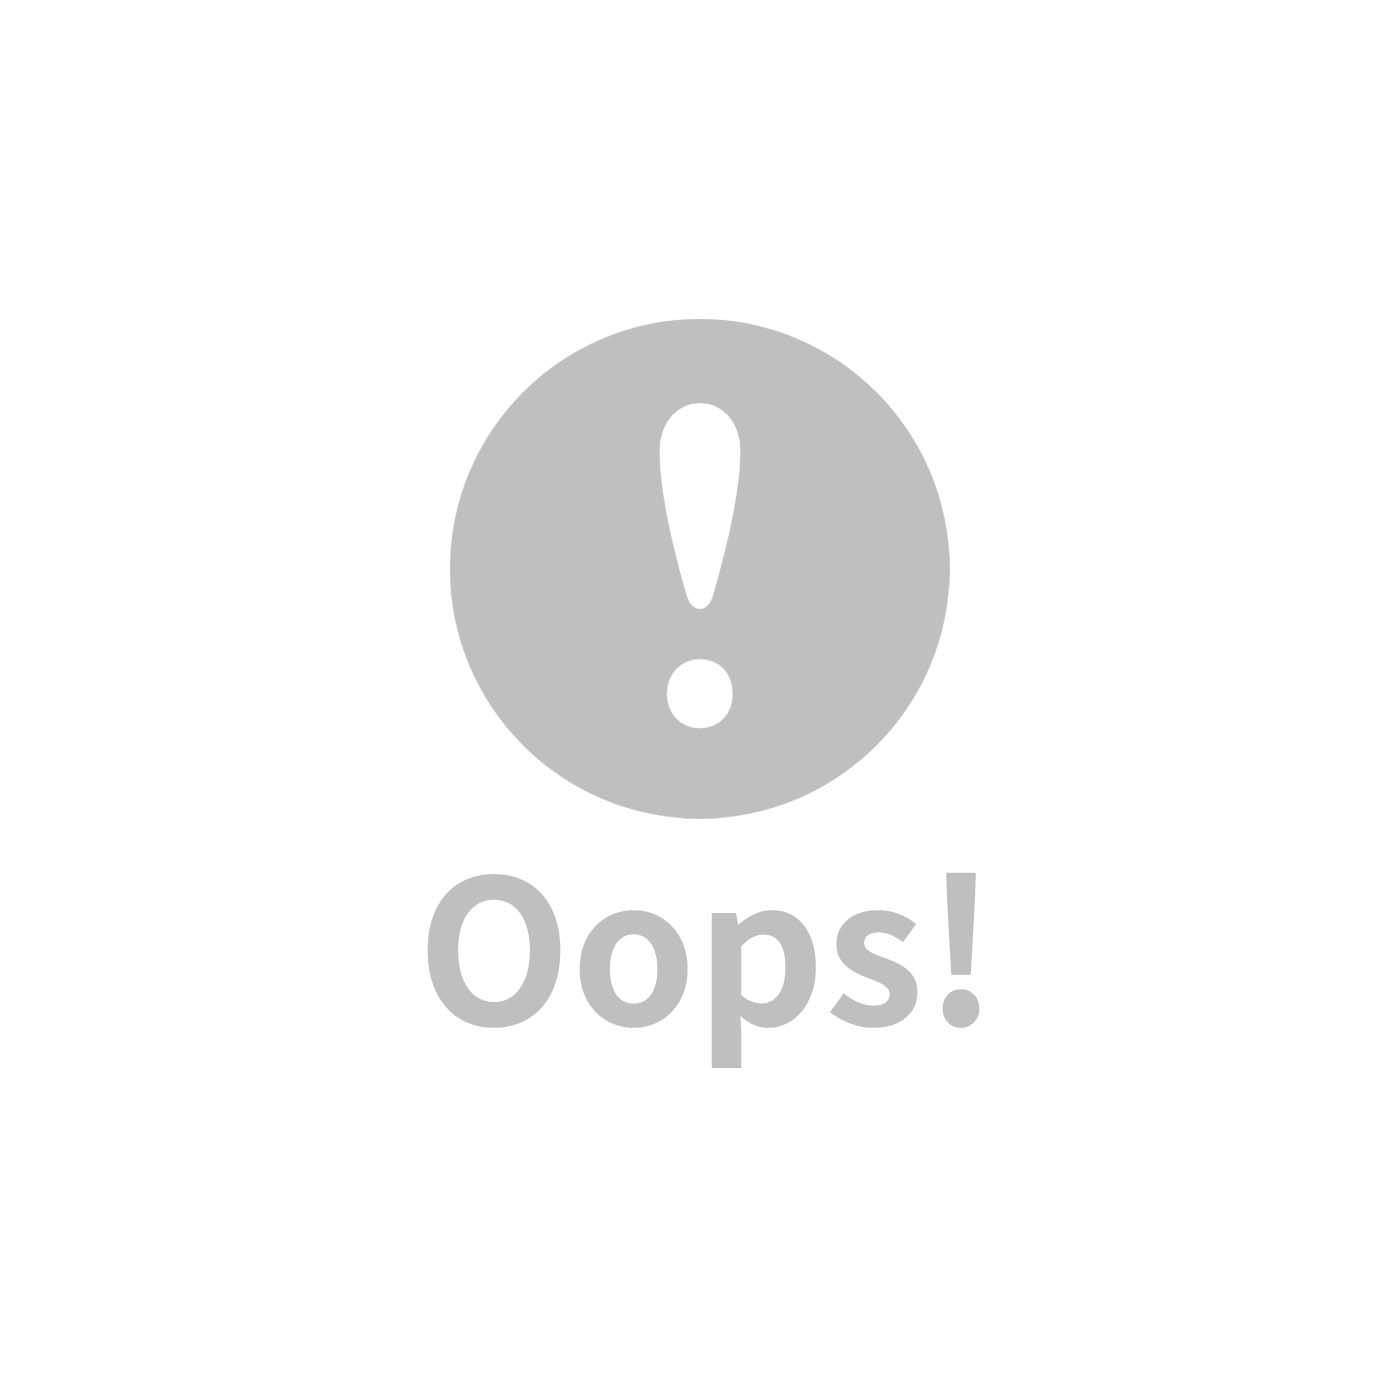 Pacific Baby 美國不鏽鋼保溫太空瓶7oz吸管杯蓋二件組(純真粉7oz+綠配件組)